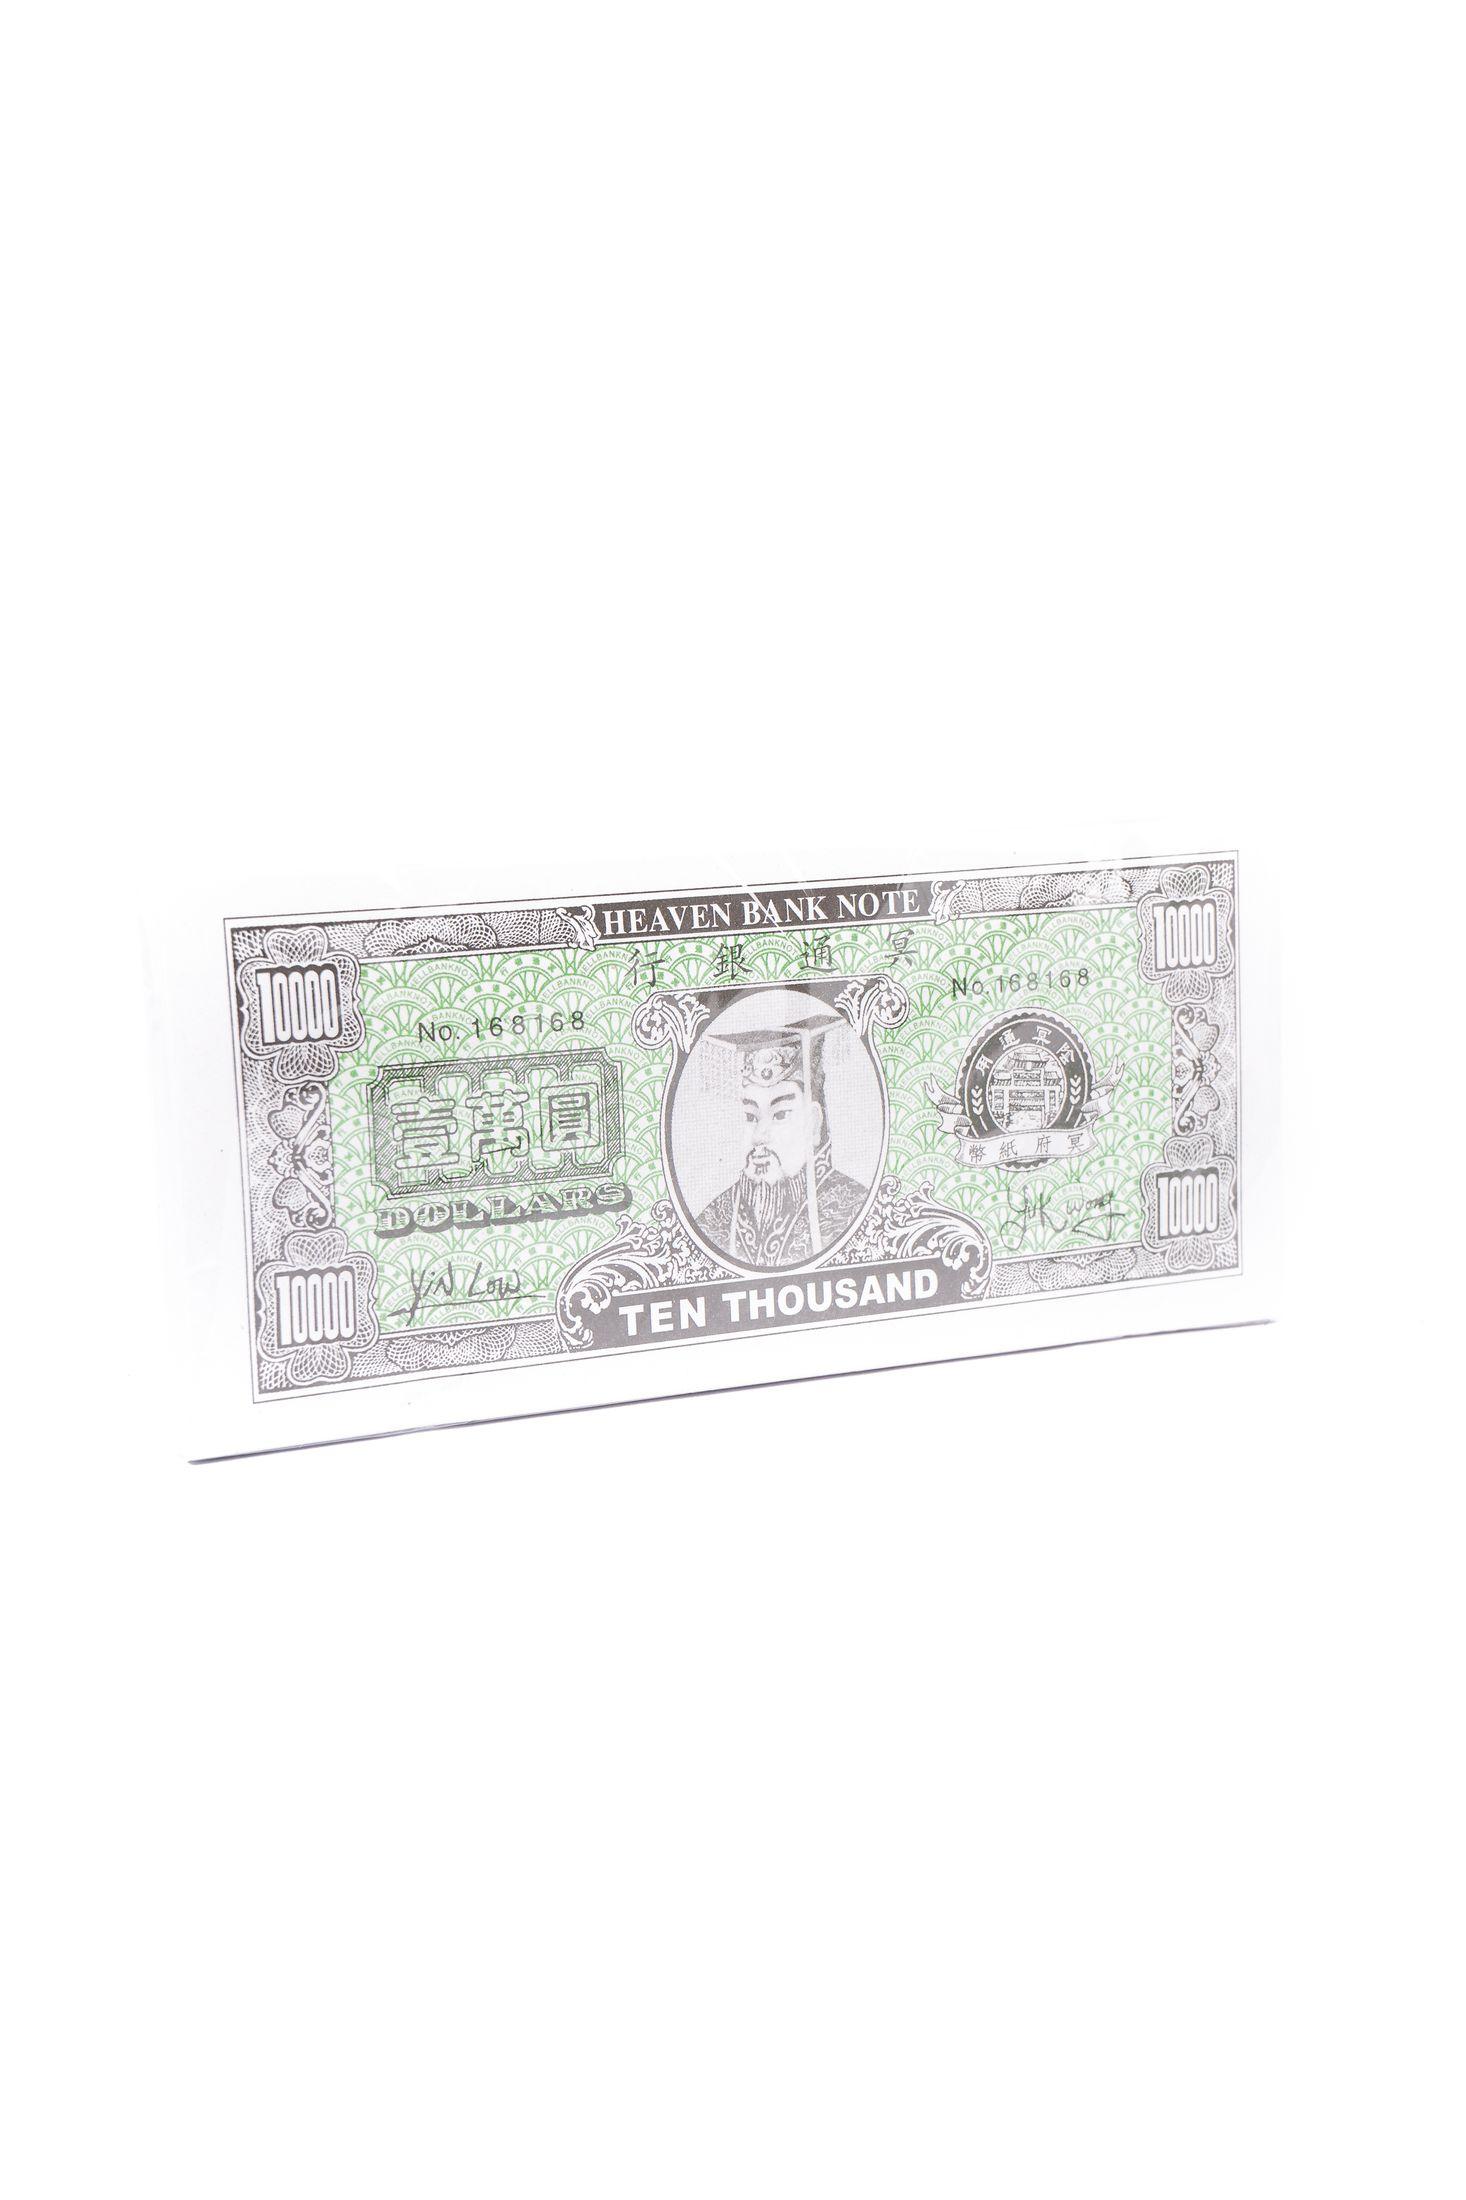 Joss papier (USD ming chi)